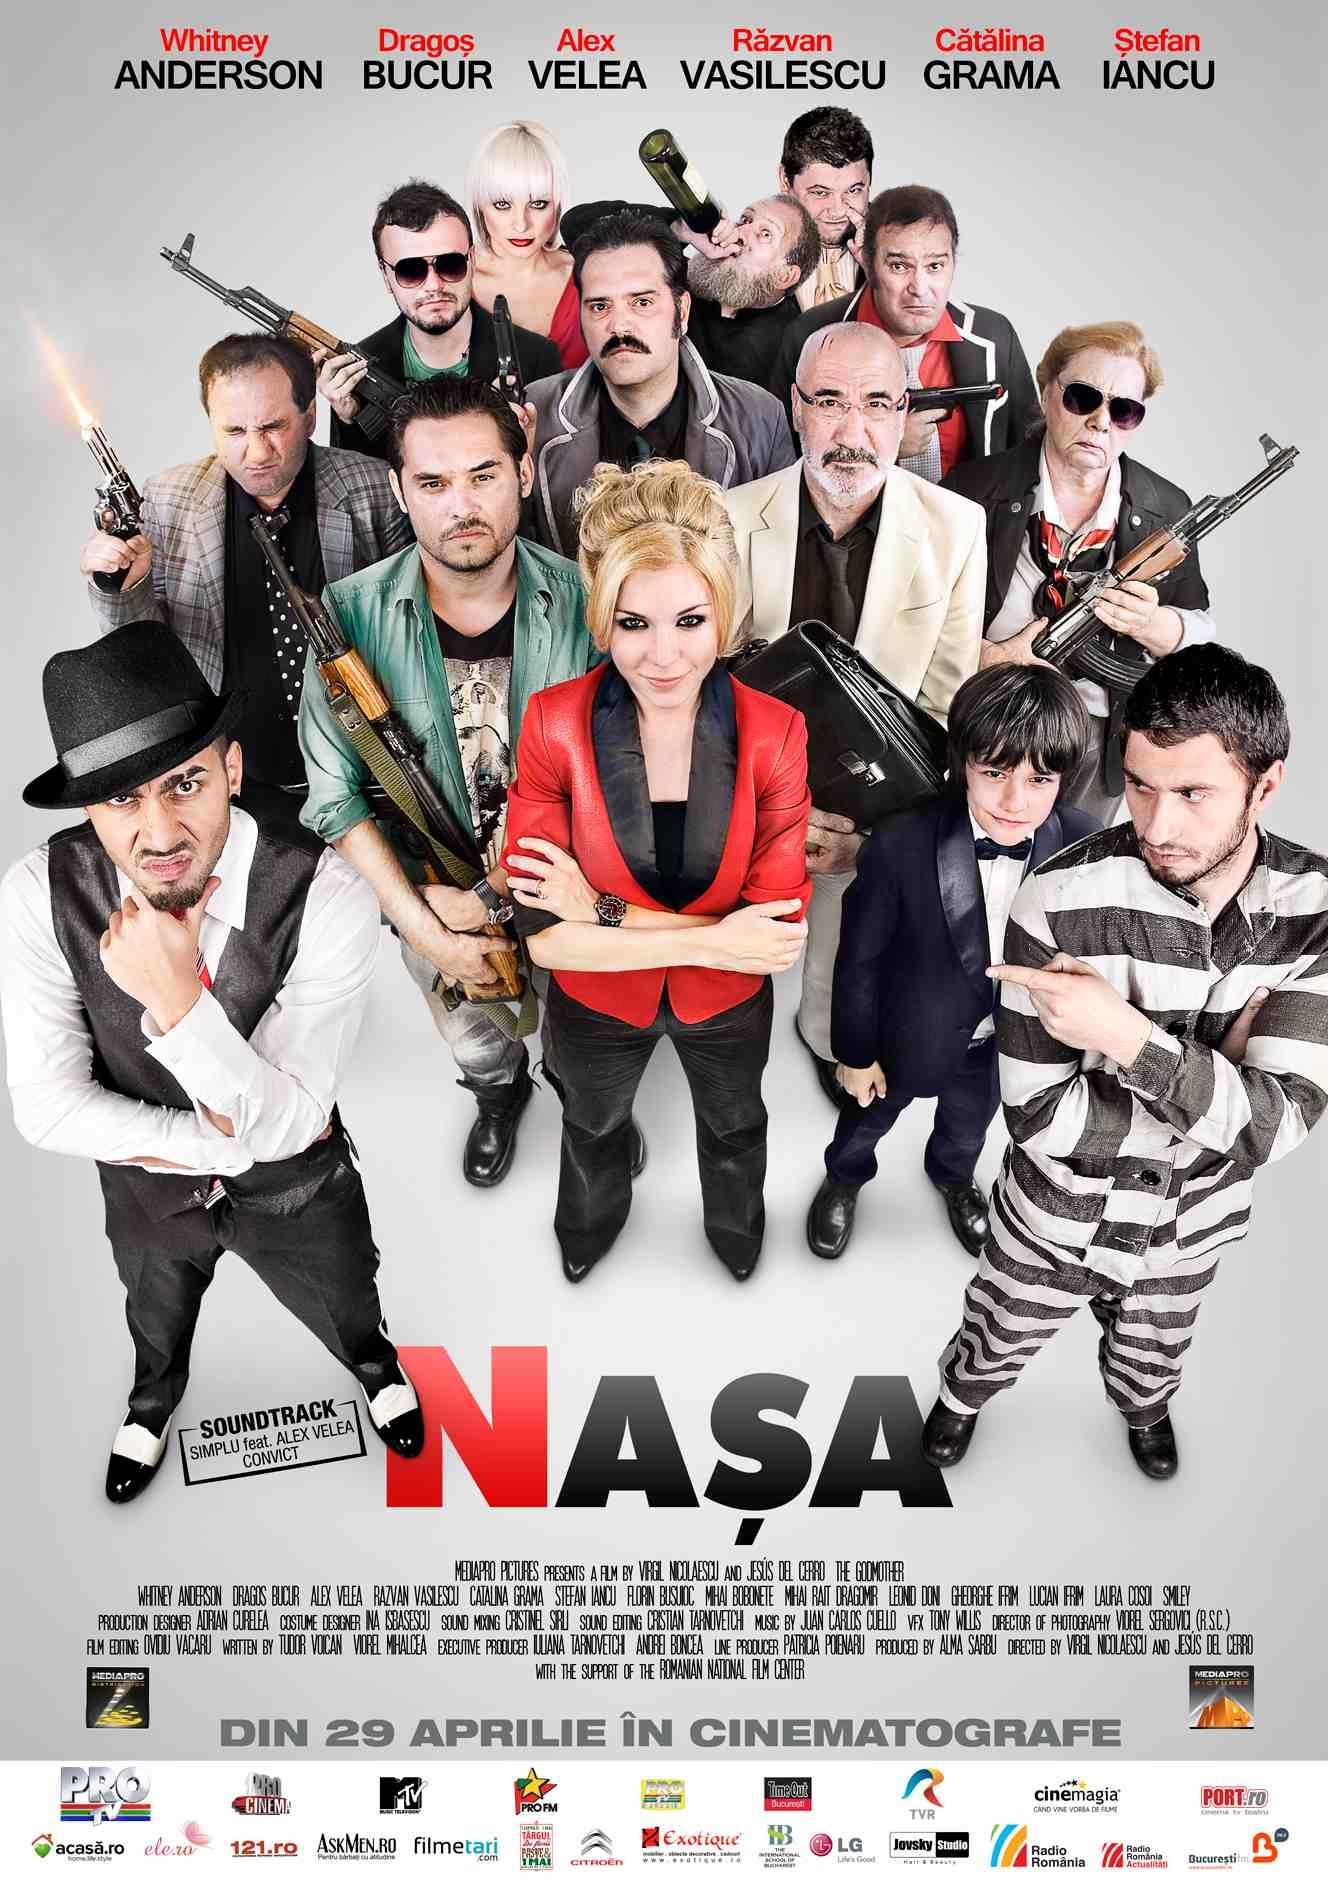 Nașa (2011) - Photo